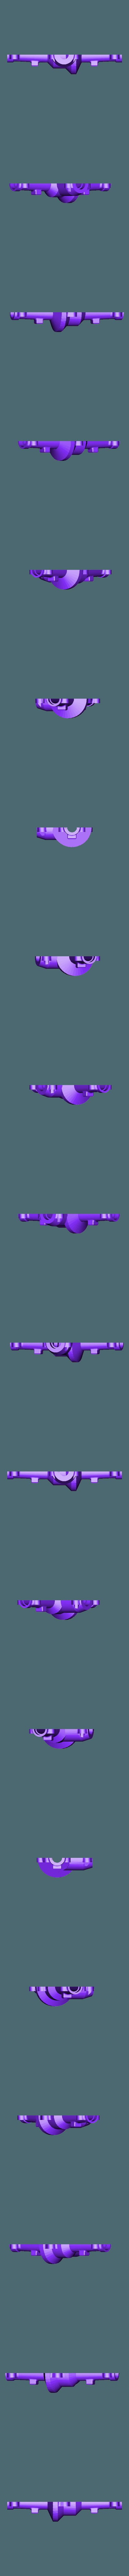 Diffhub_bottom.STL Download free STL file Printed truck: Rear axle V1 • 3D print model, MrCrankyface